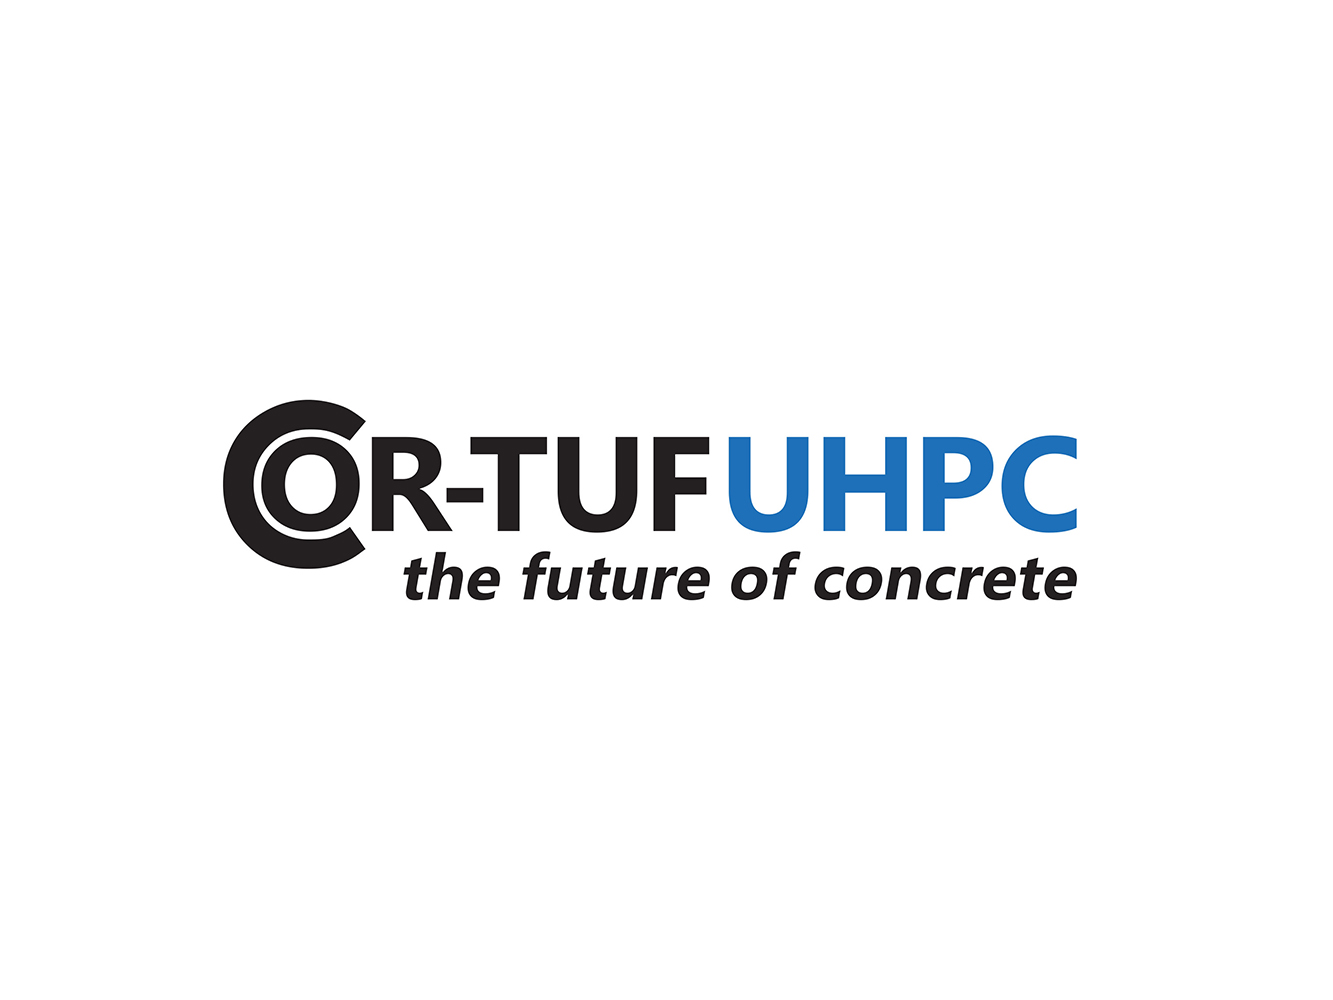 Cor-Tuf UHPC